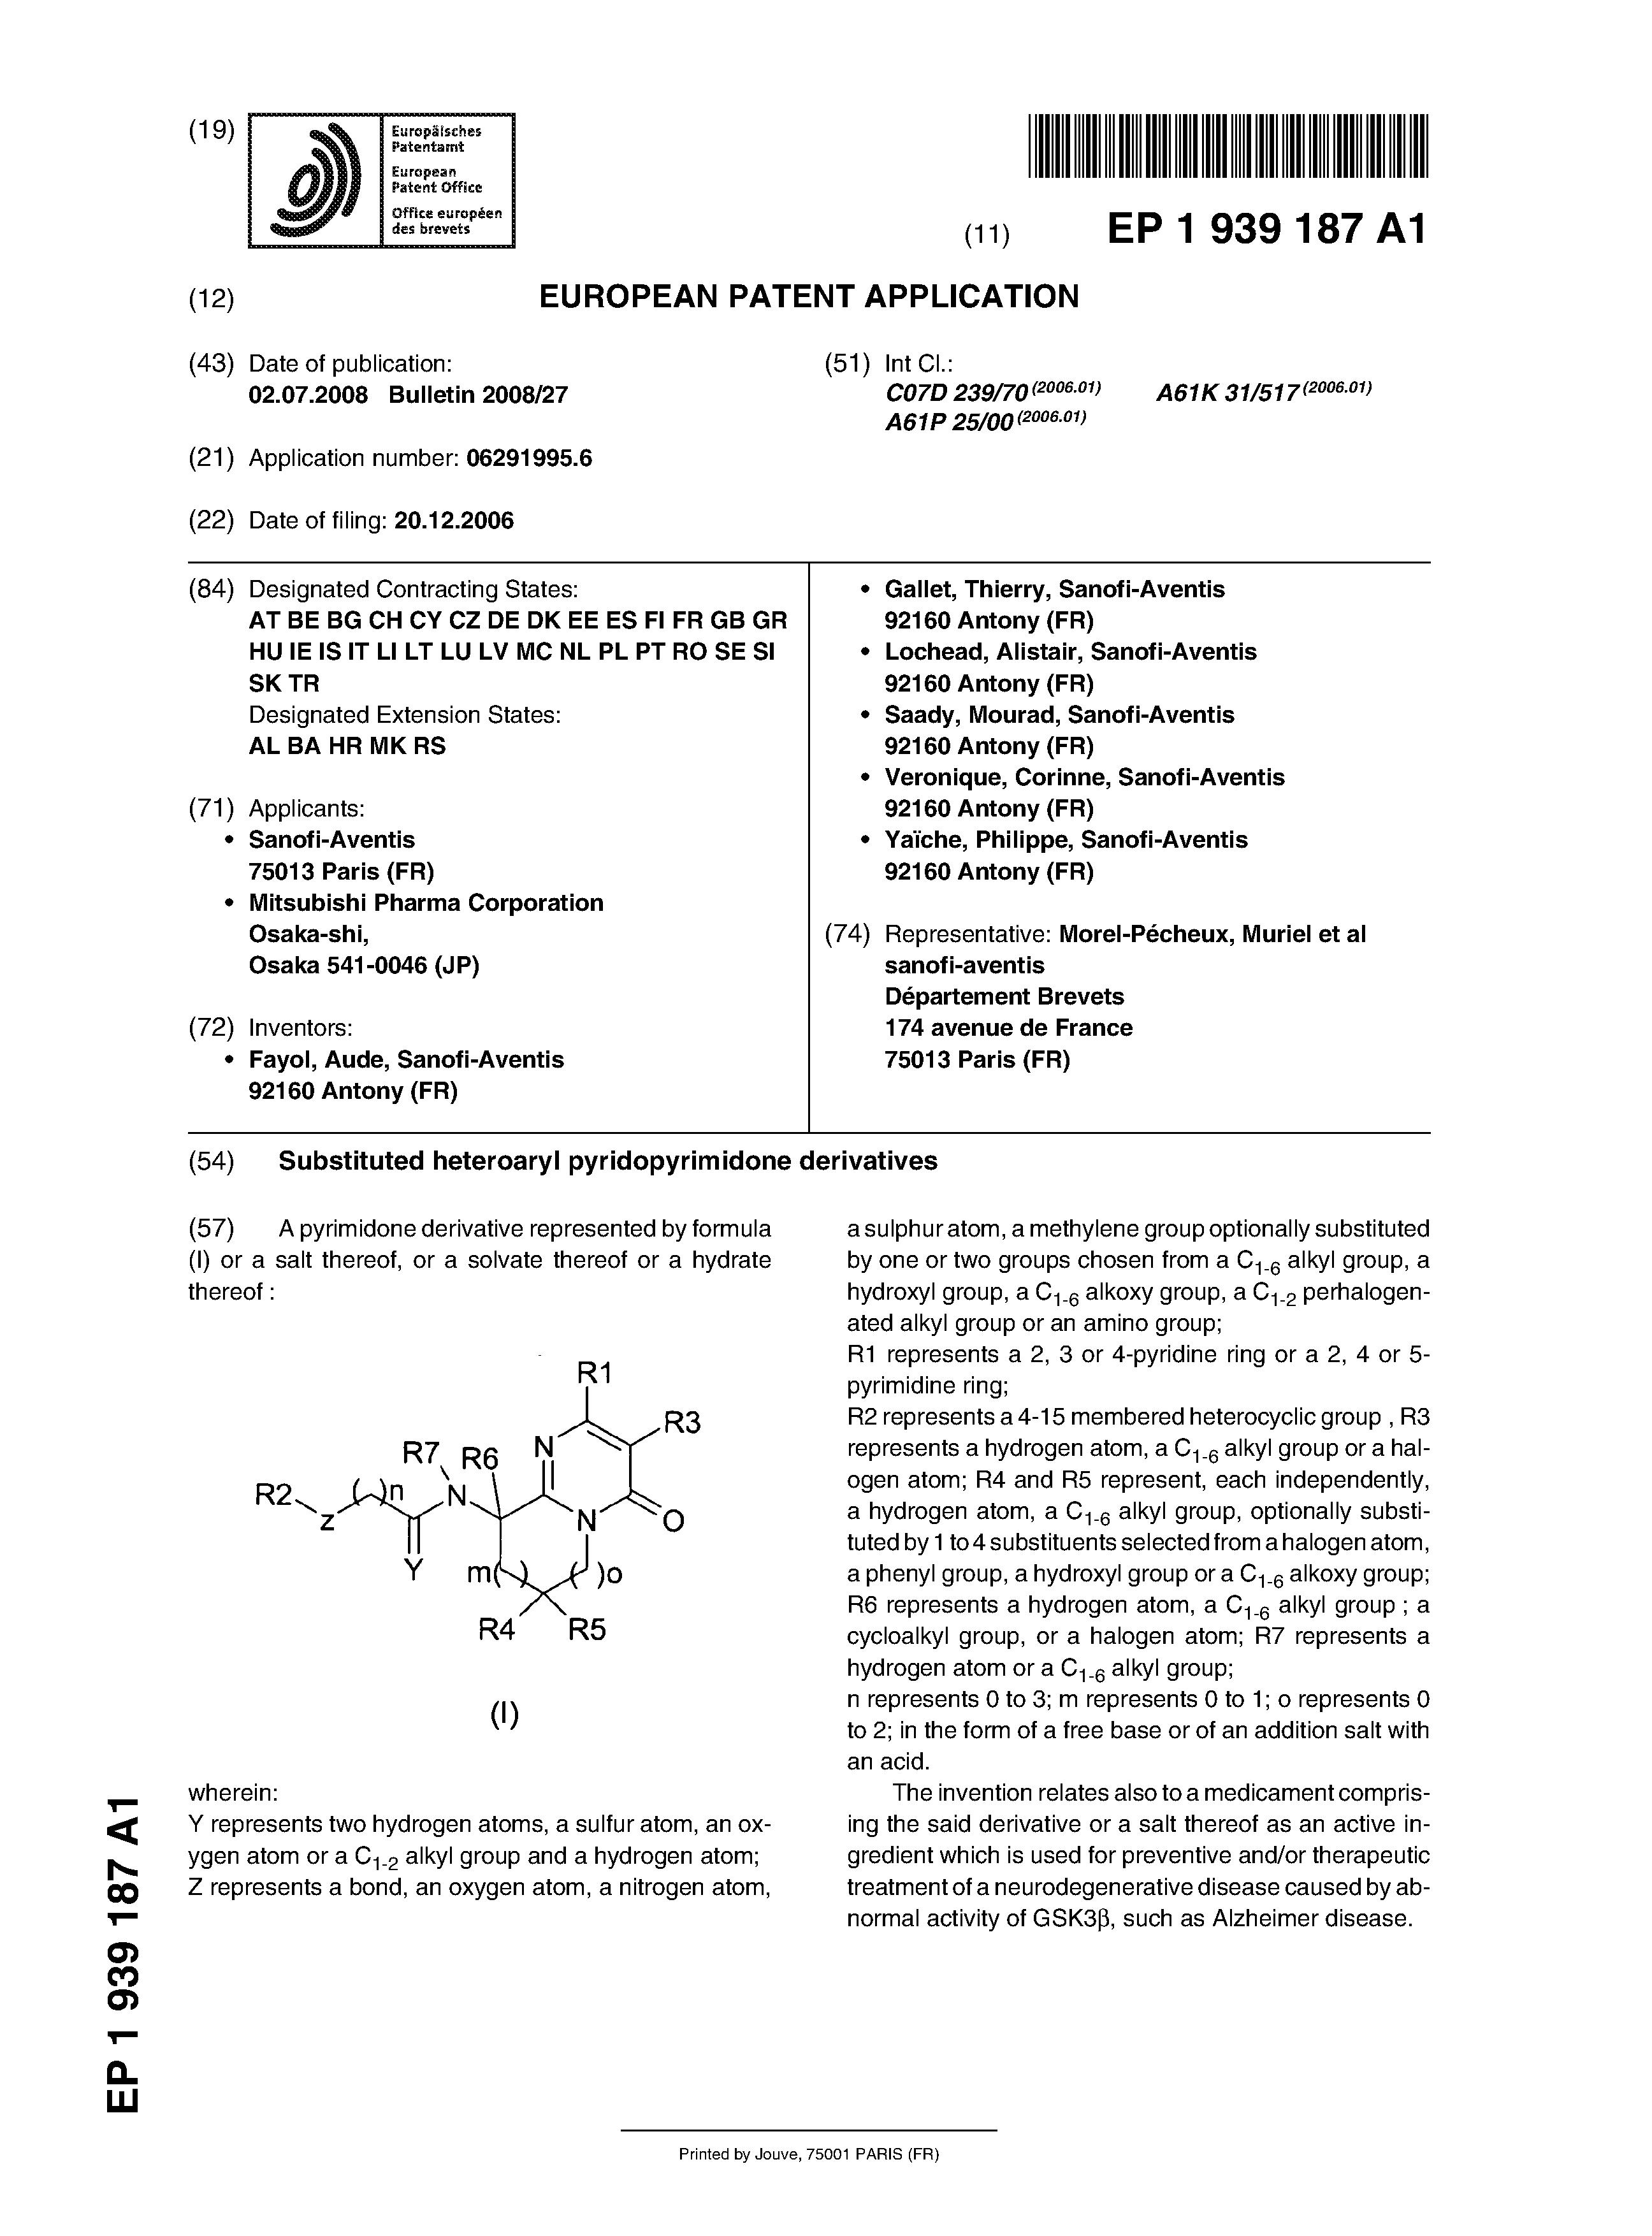 EP 2121635 A2 - Substituted Heteroaryl Pyridopyrimidone Derivatives